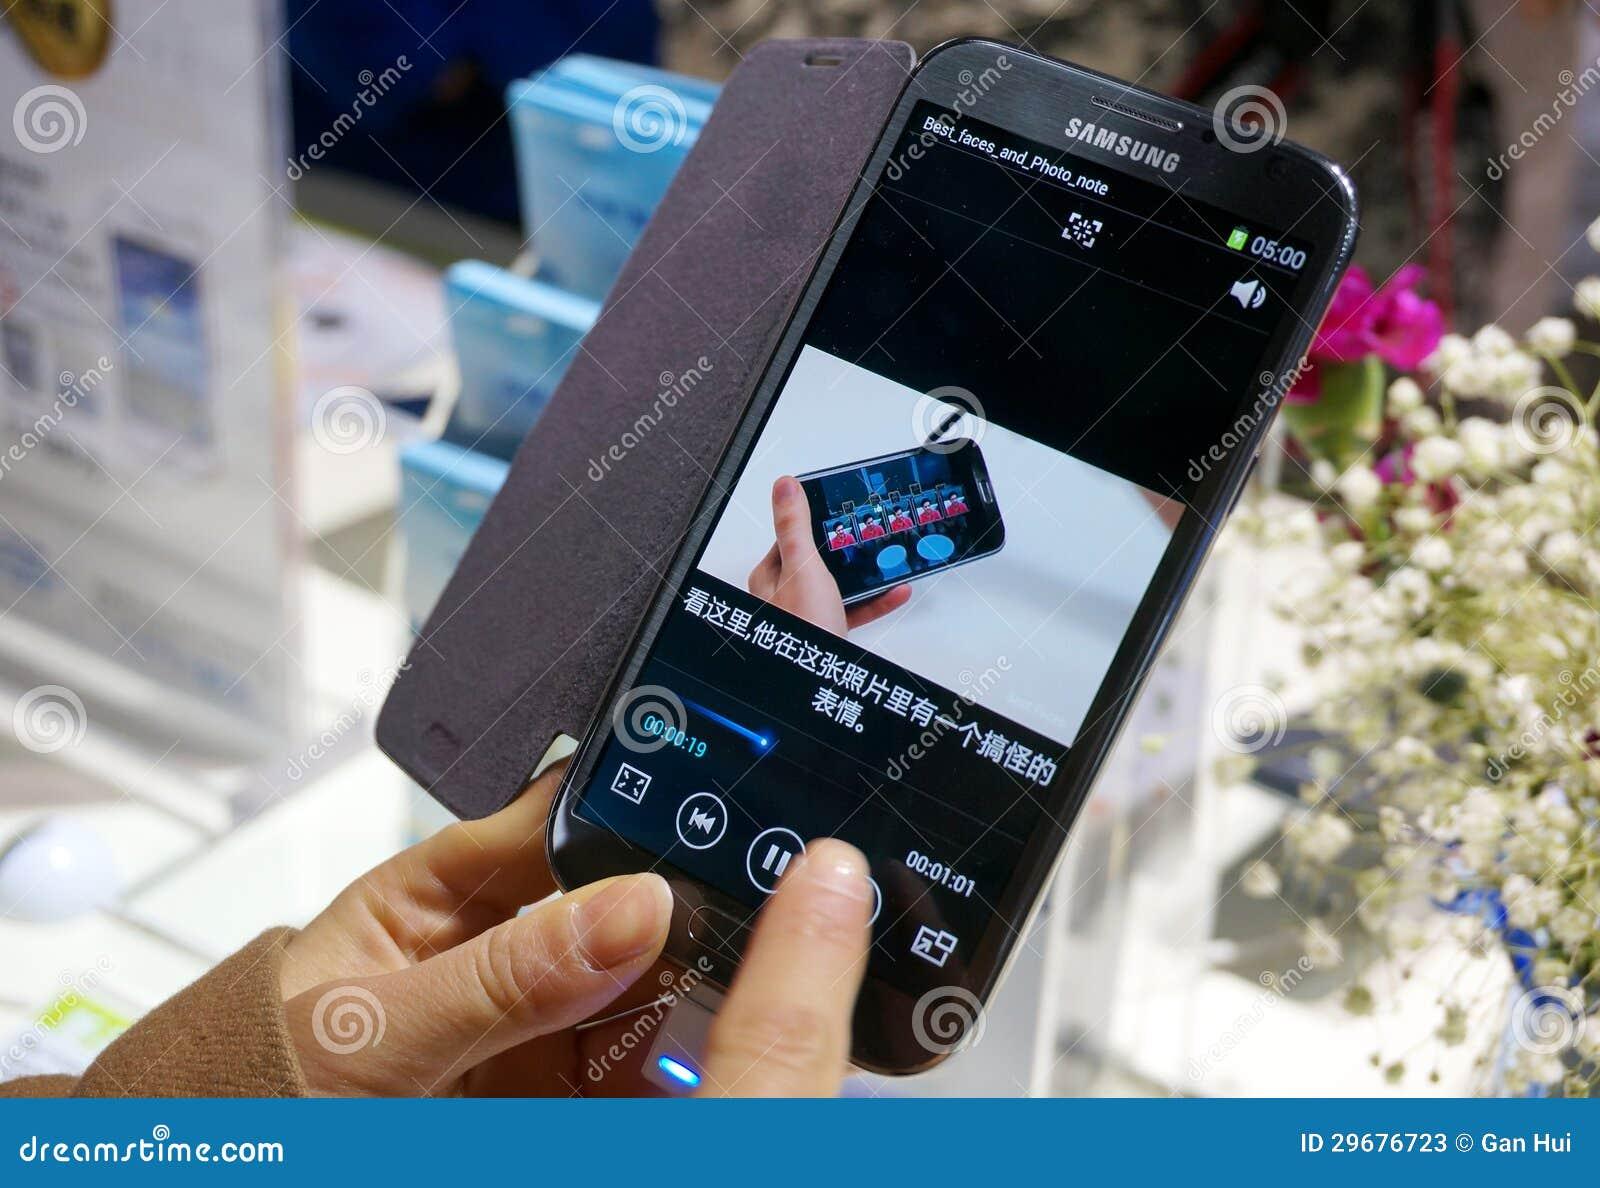 how to send sms photo samsung phone telus